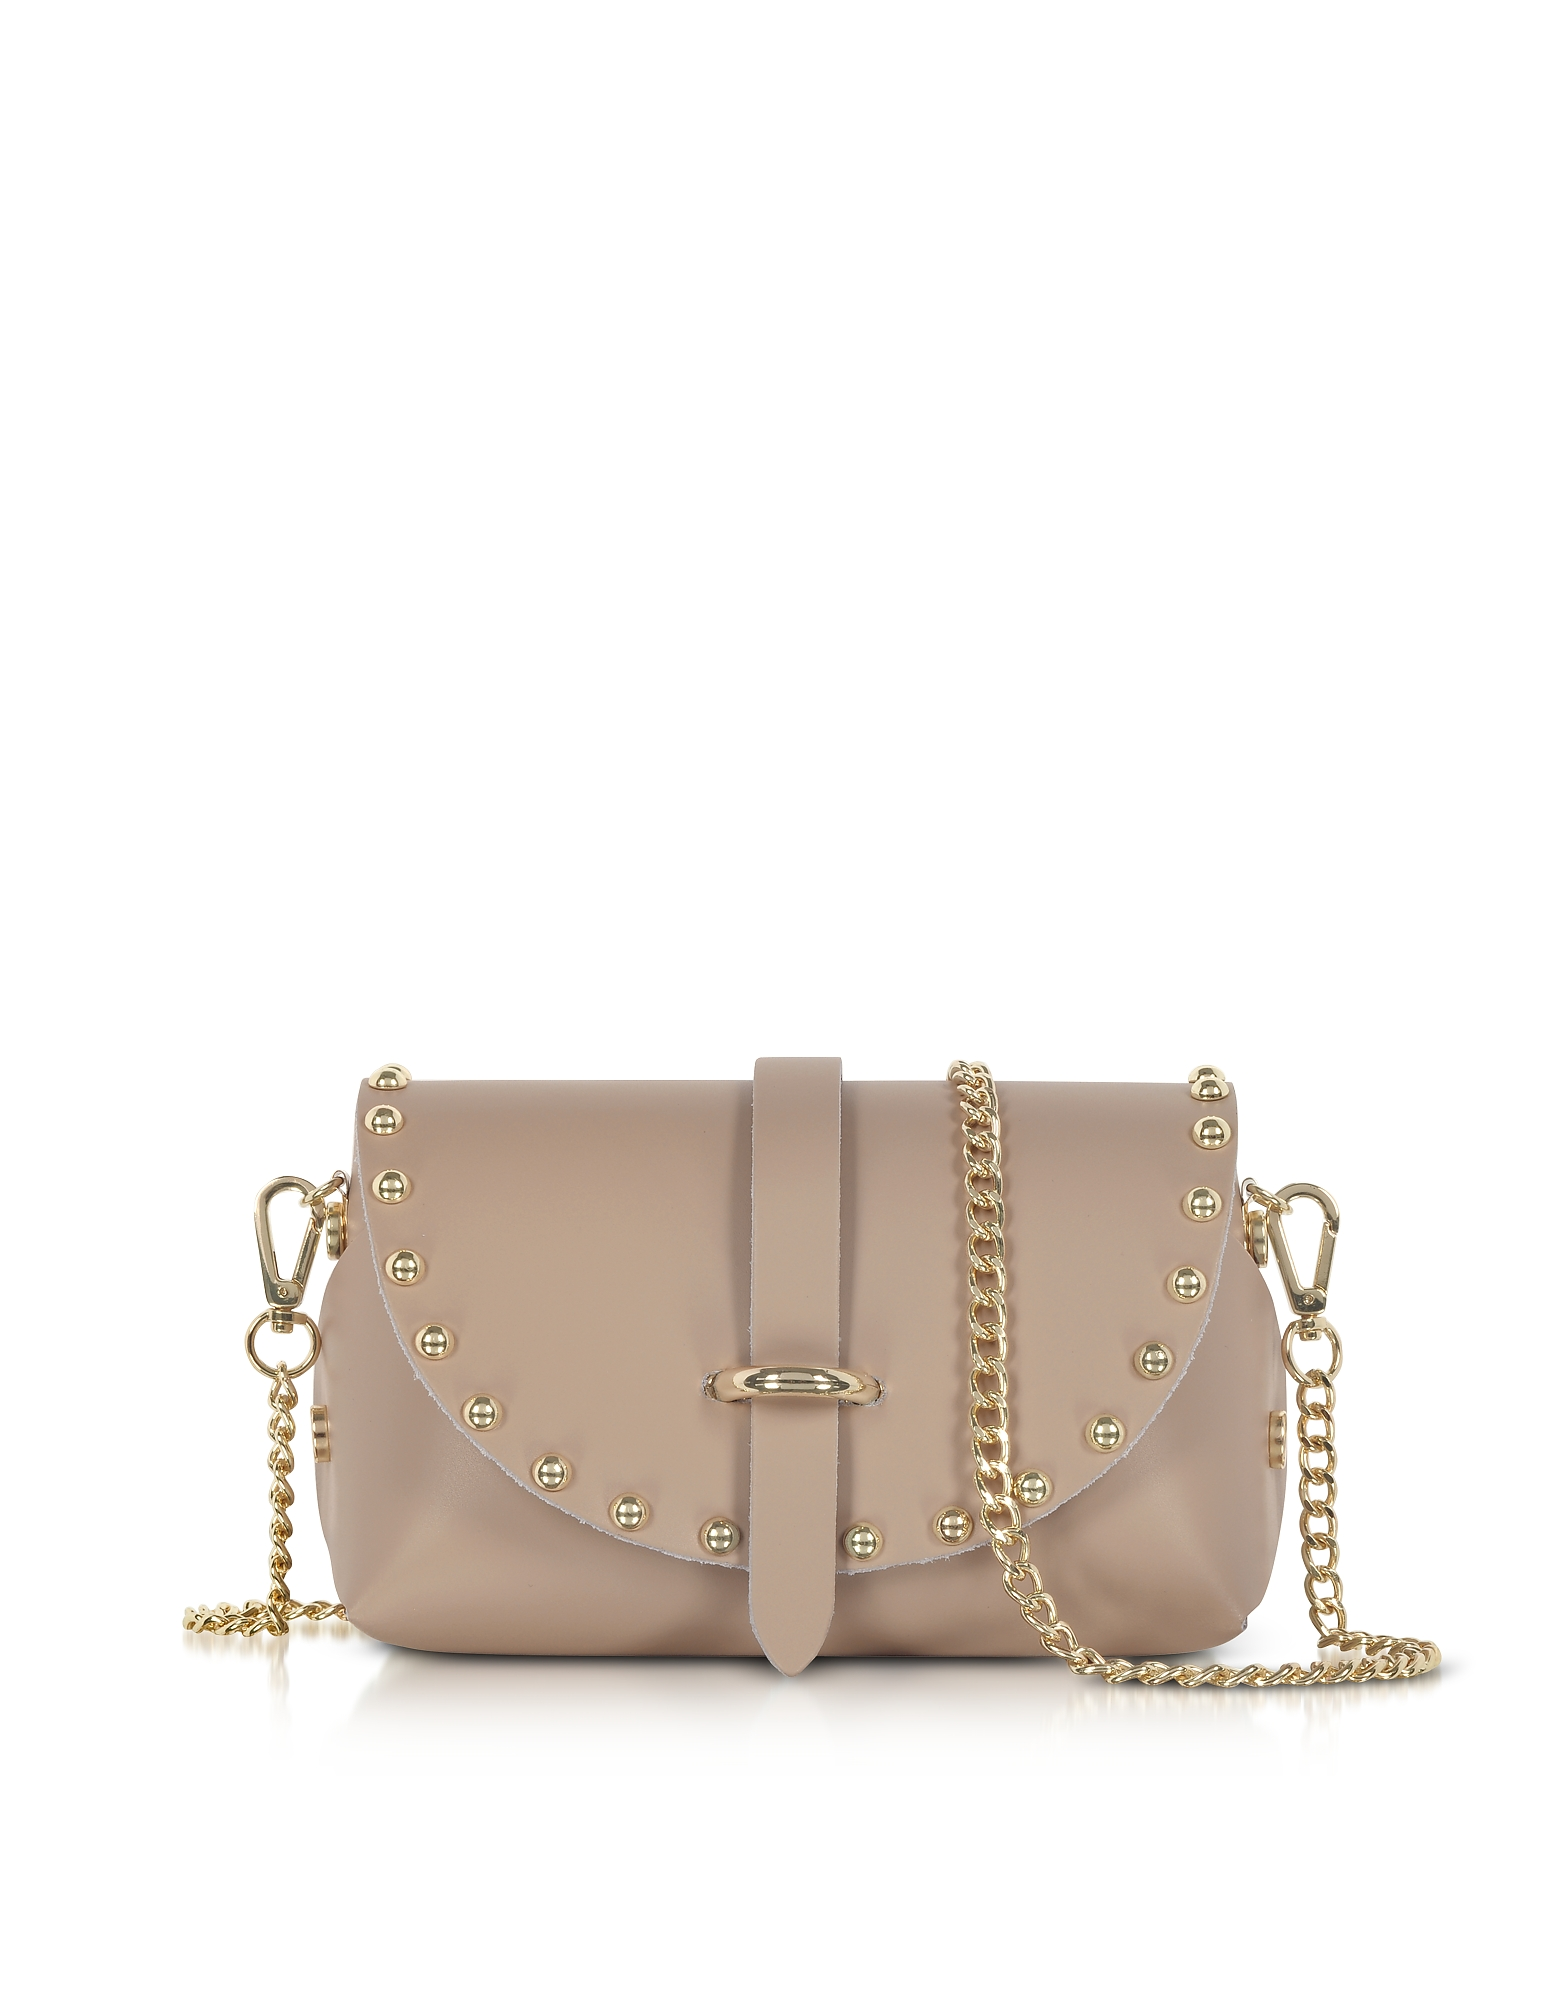 Le Parmentier Designer Handbags, Caviar Mini Nude Leather Shoulder Bag w/Studs